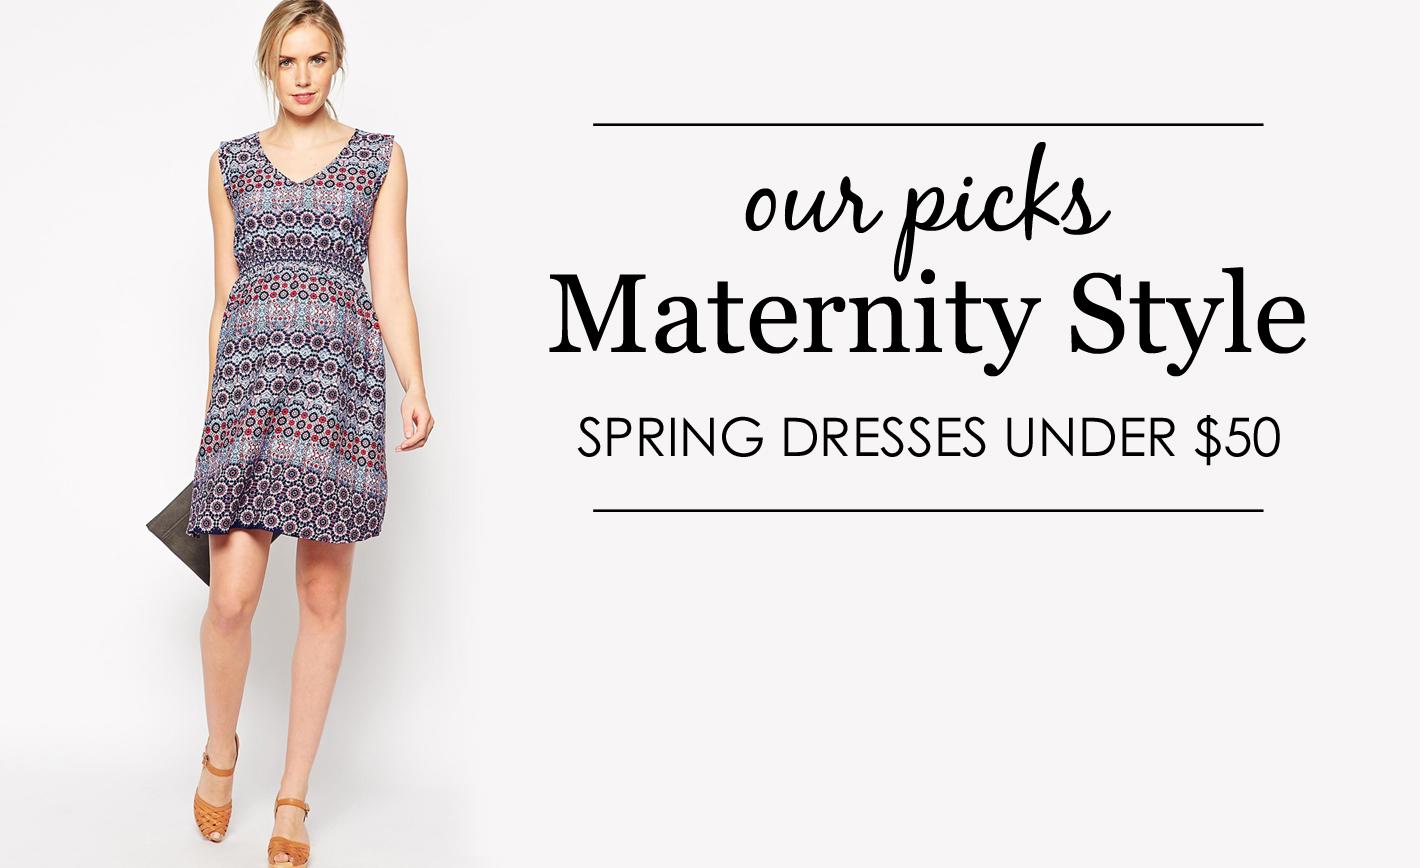 Spring Maternity Dresses Under $50